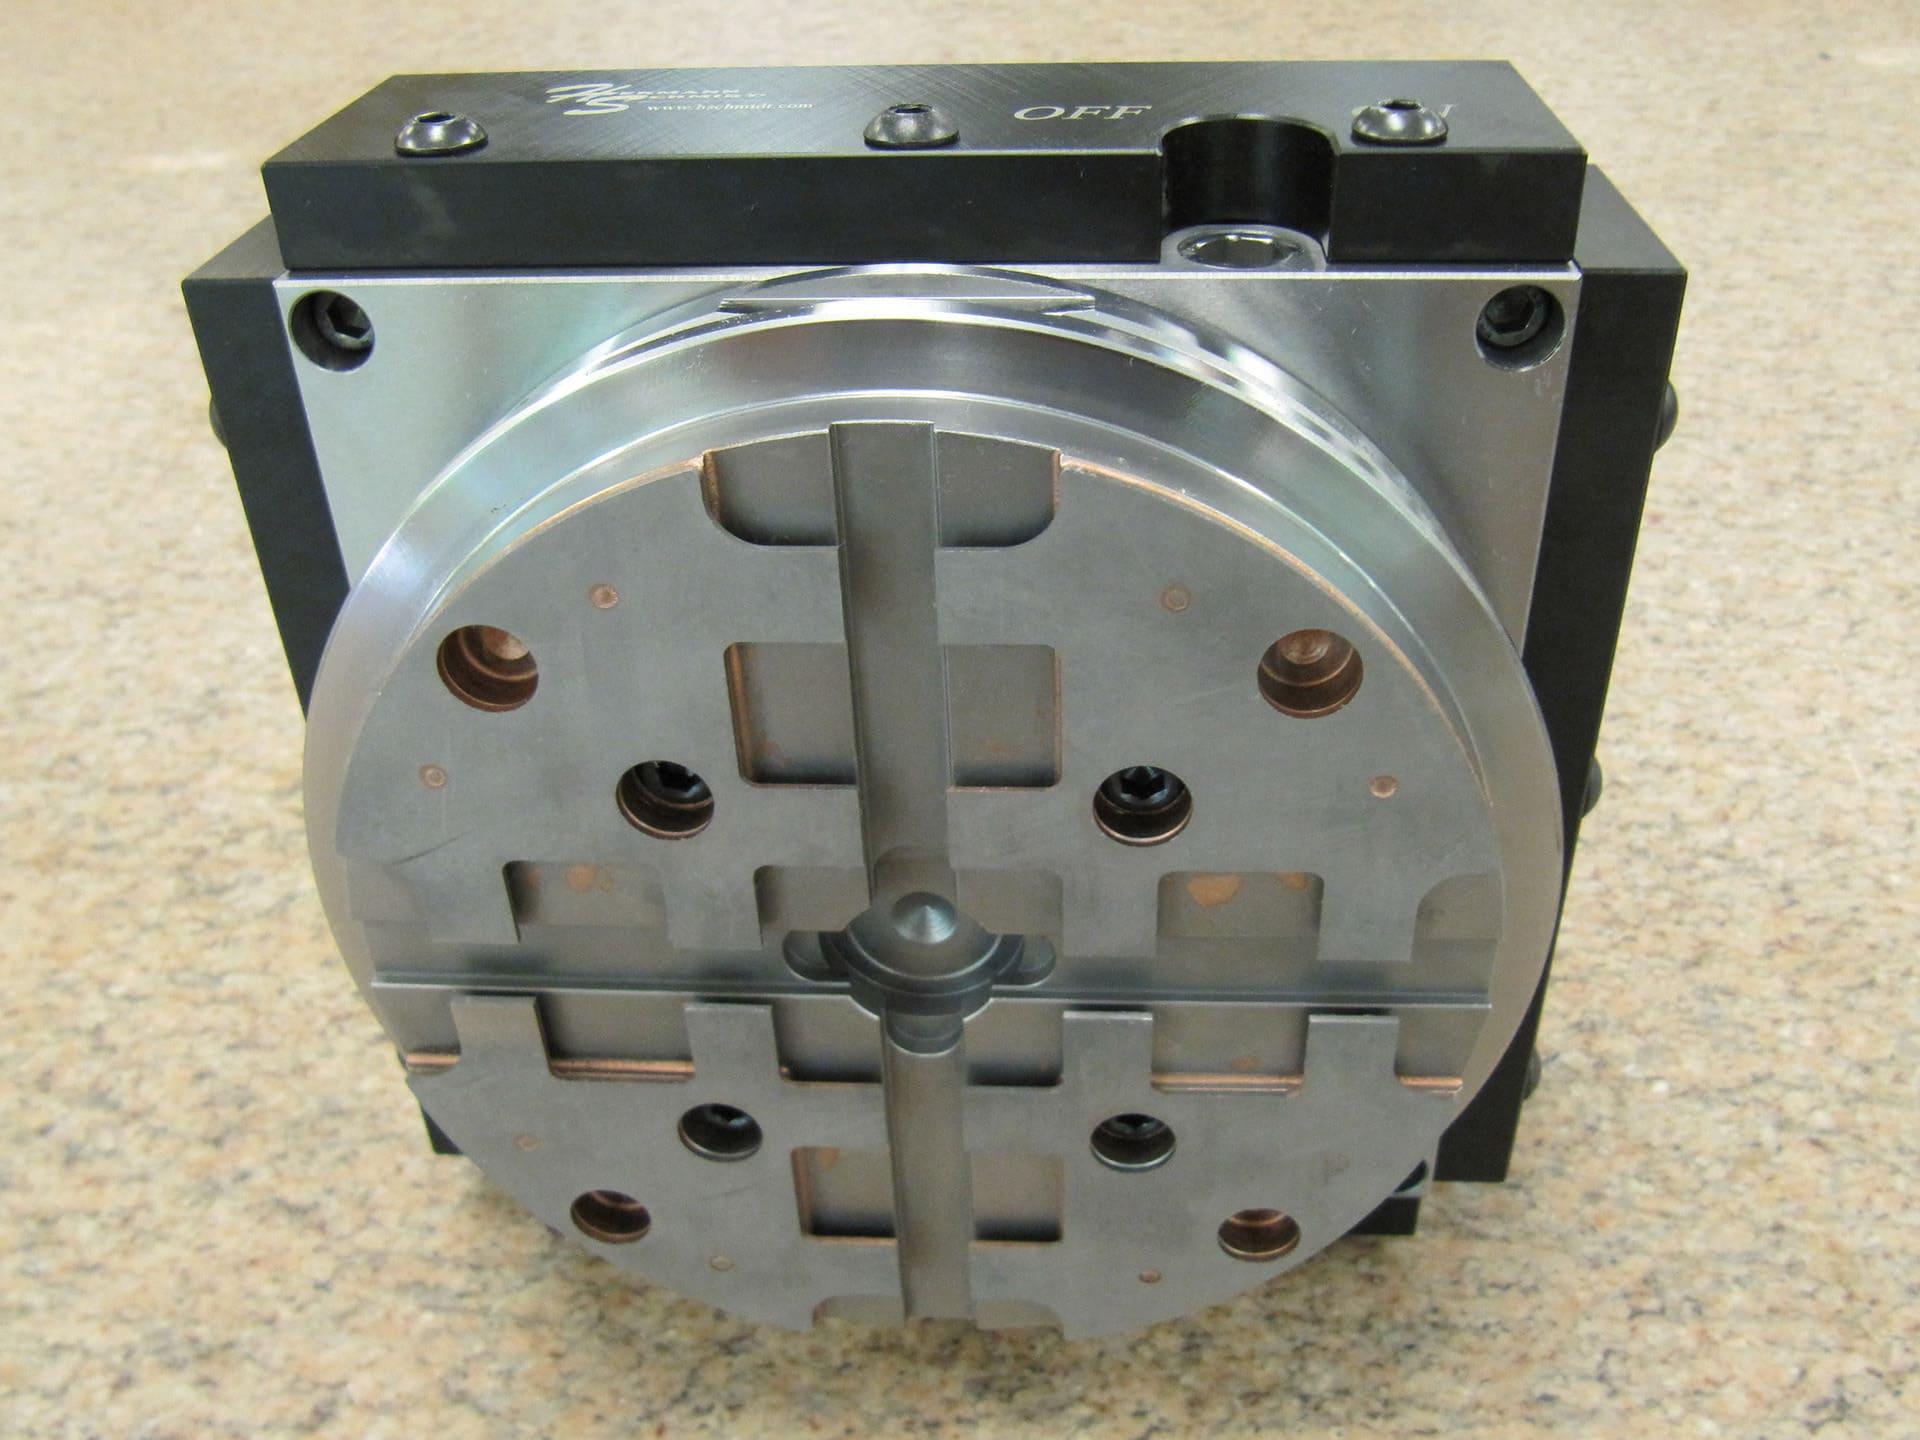 6 Quot X6 Quot Hard Milling Magnet On System 3r Macromagnum Pallet